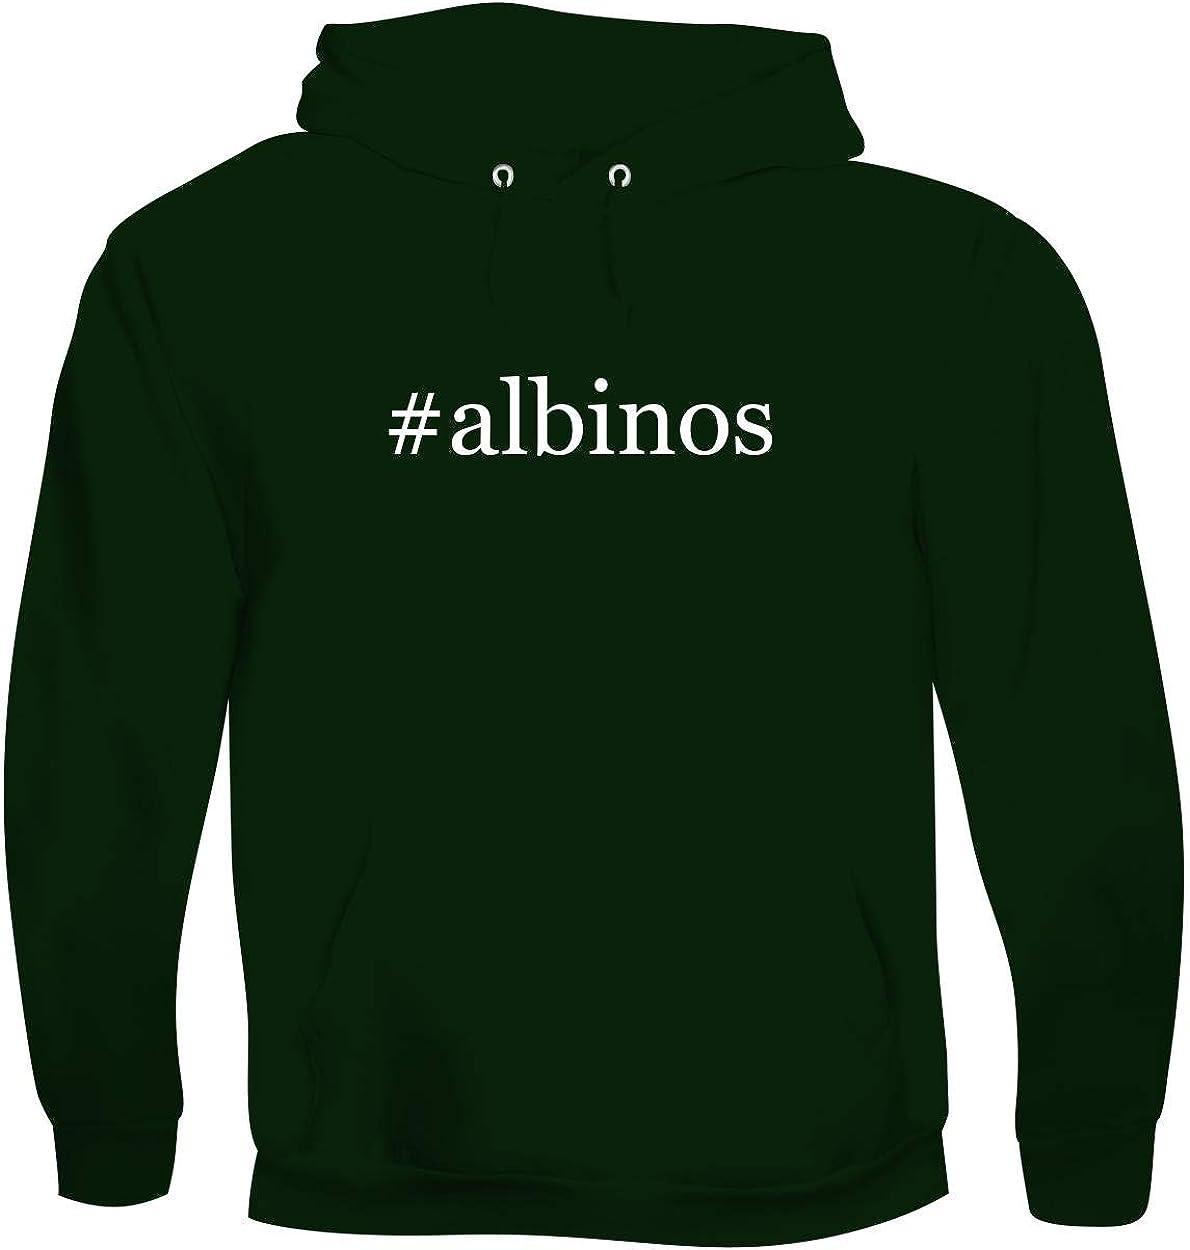 #albinos - Men's Hashtag Soft & Comfortable Hoodie Sweatshirt Pullover